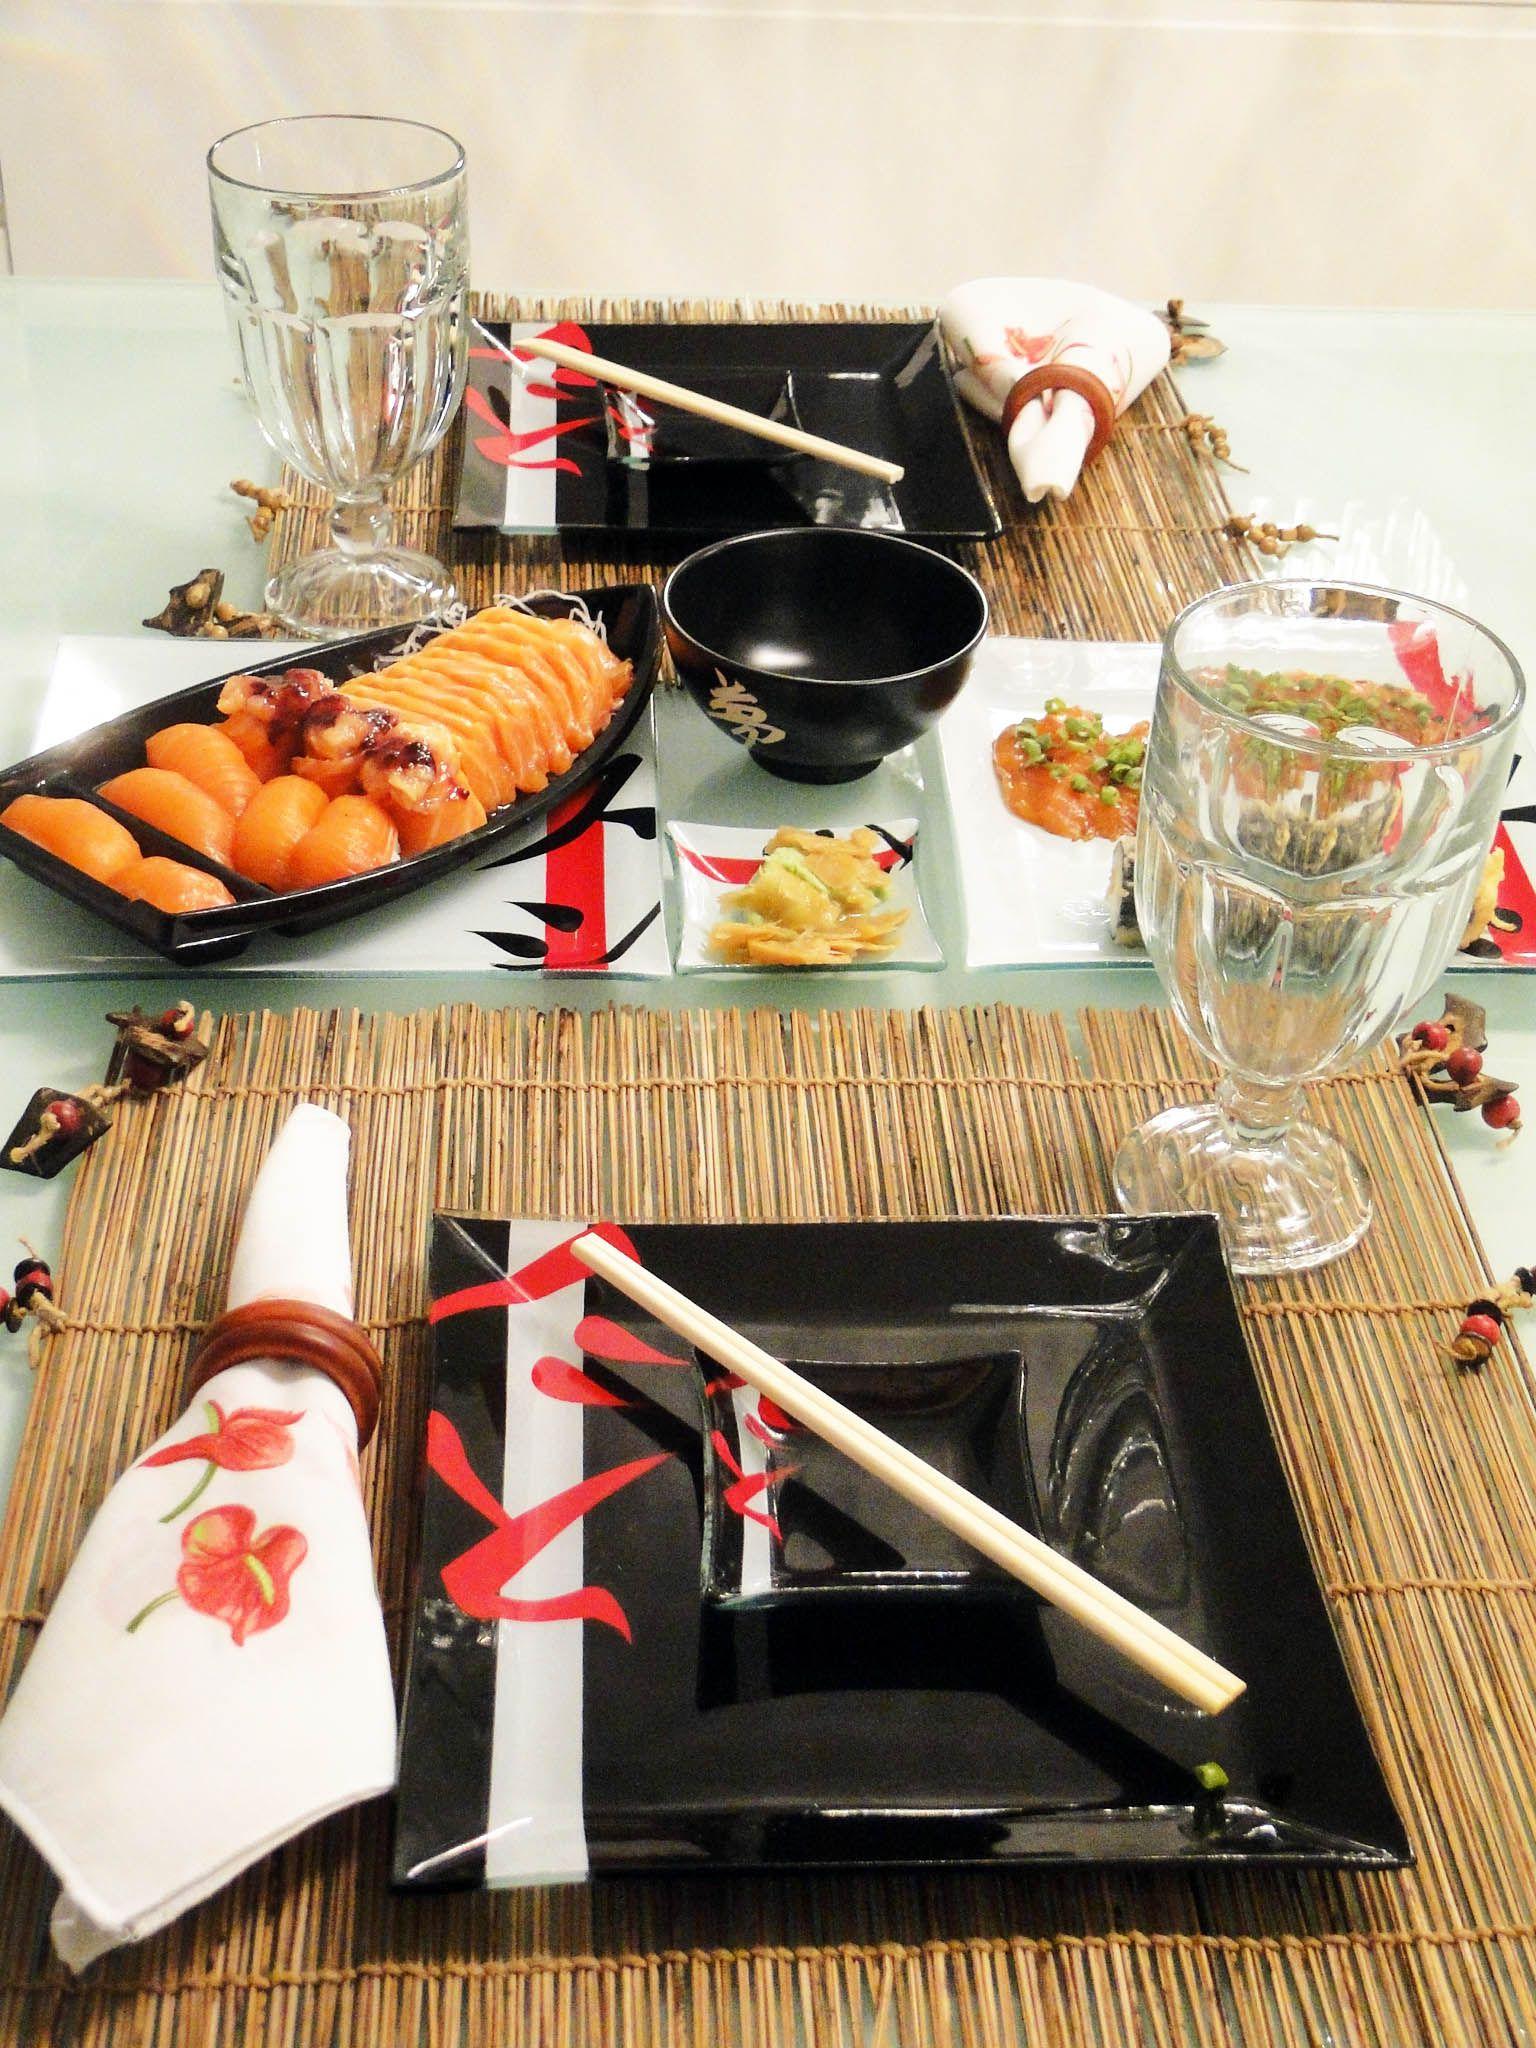 Mesa posta jantar japon s blog da michelle mayrink for Mesa japonesa tradicional